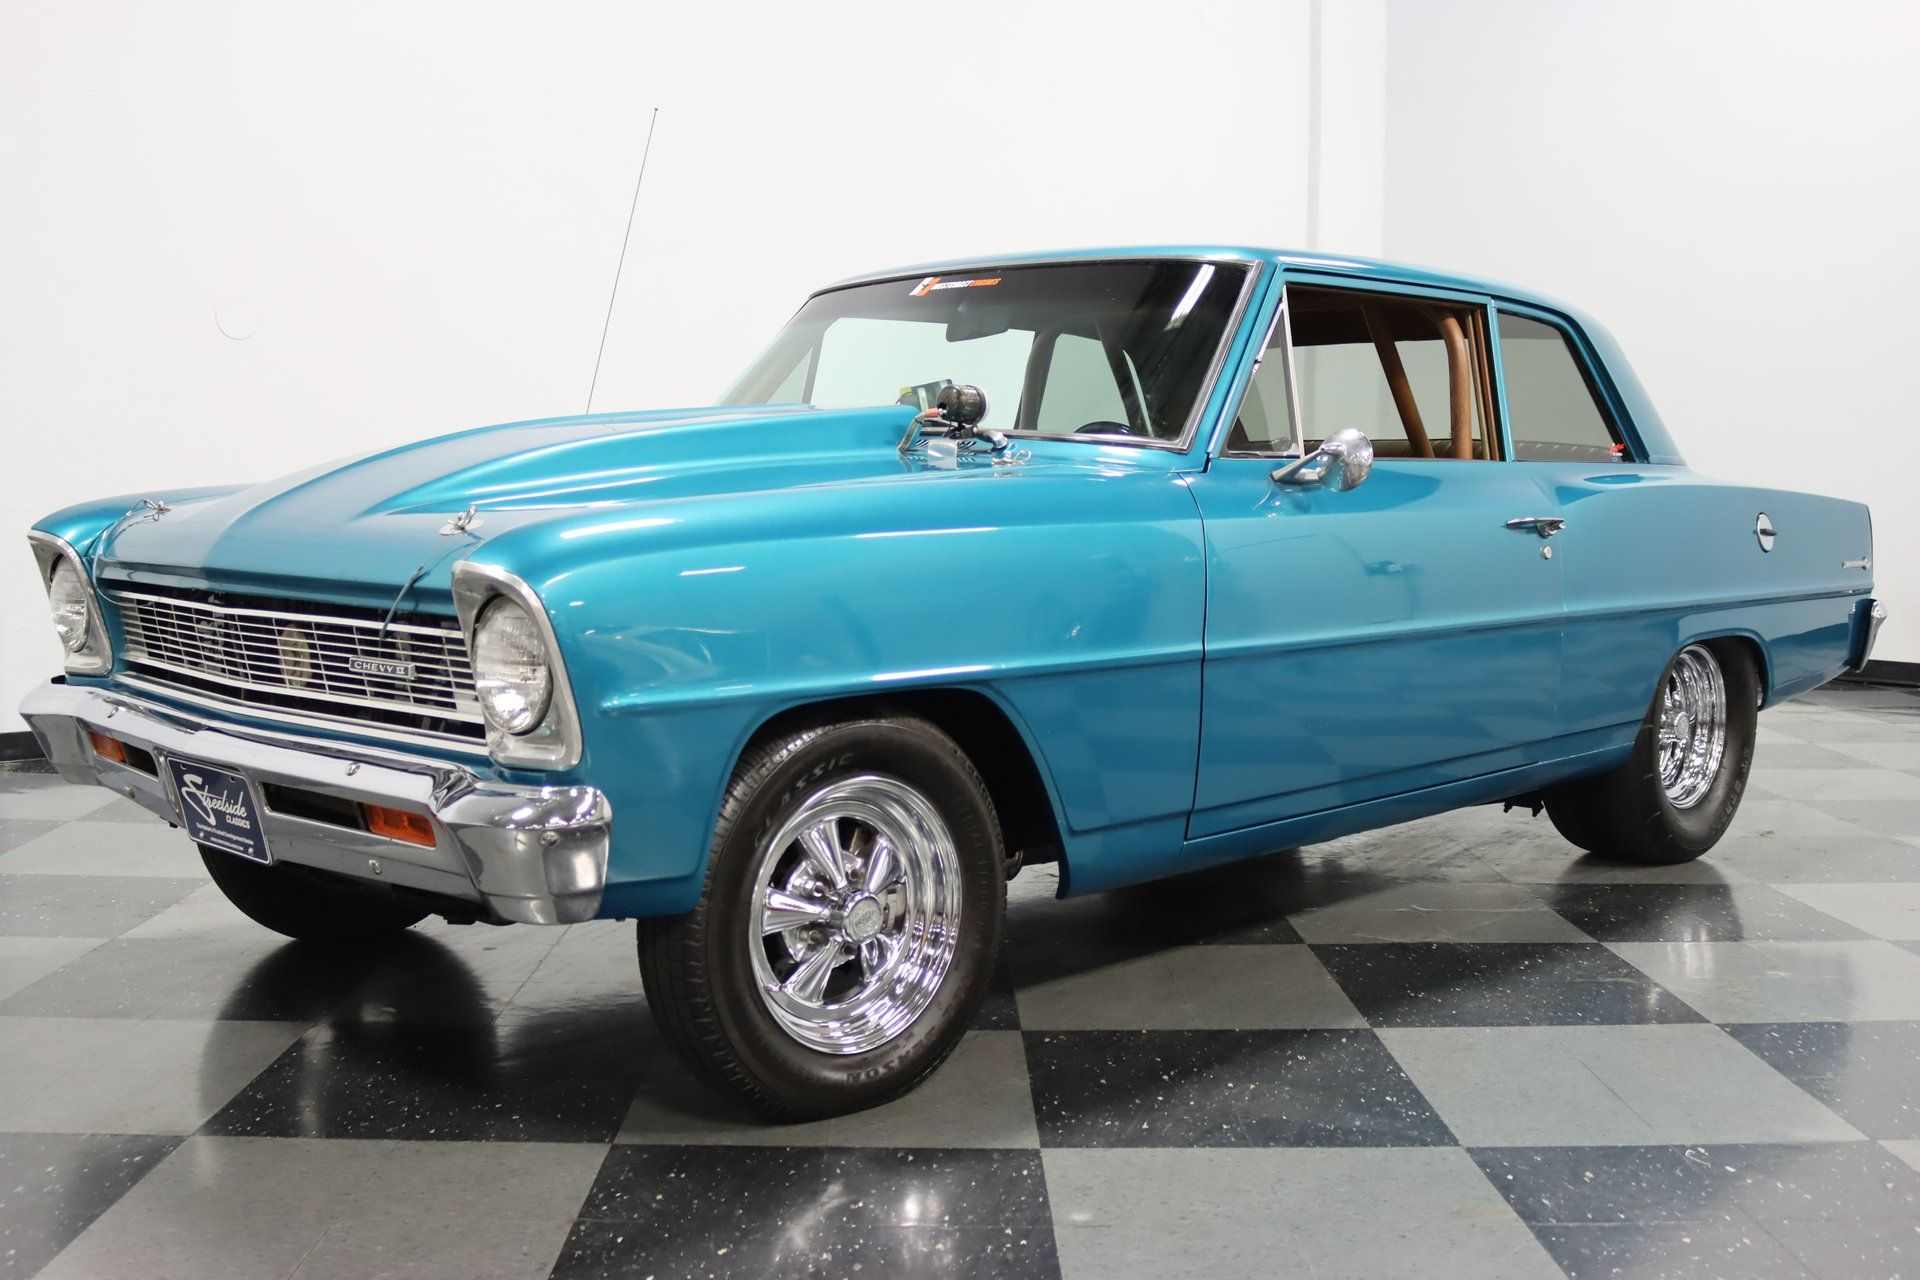 "<img src=""1966-chevy-nova.jpg"" alt=""A 1966 Chevrolet Nova Pro Street car up for grabs"">"